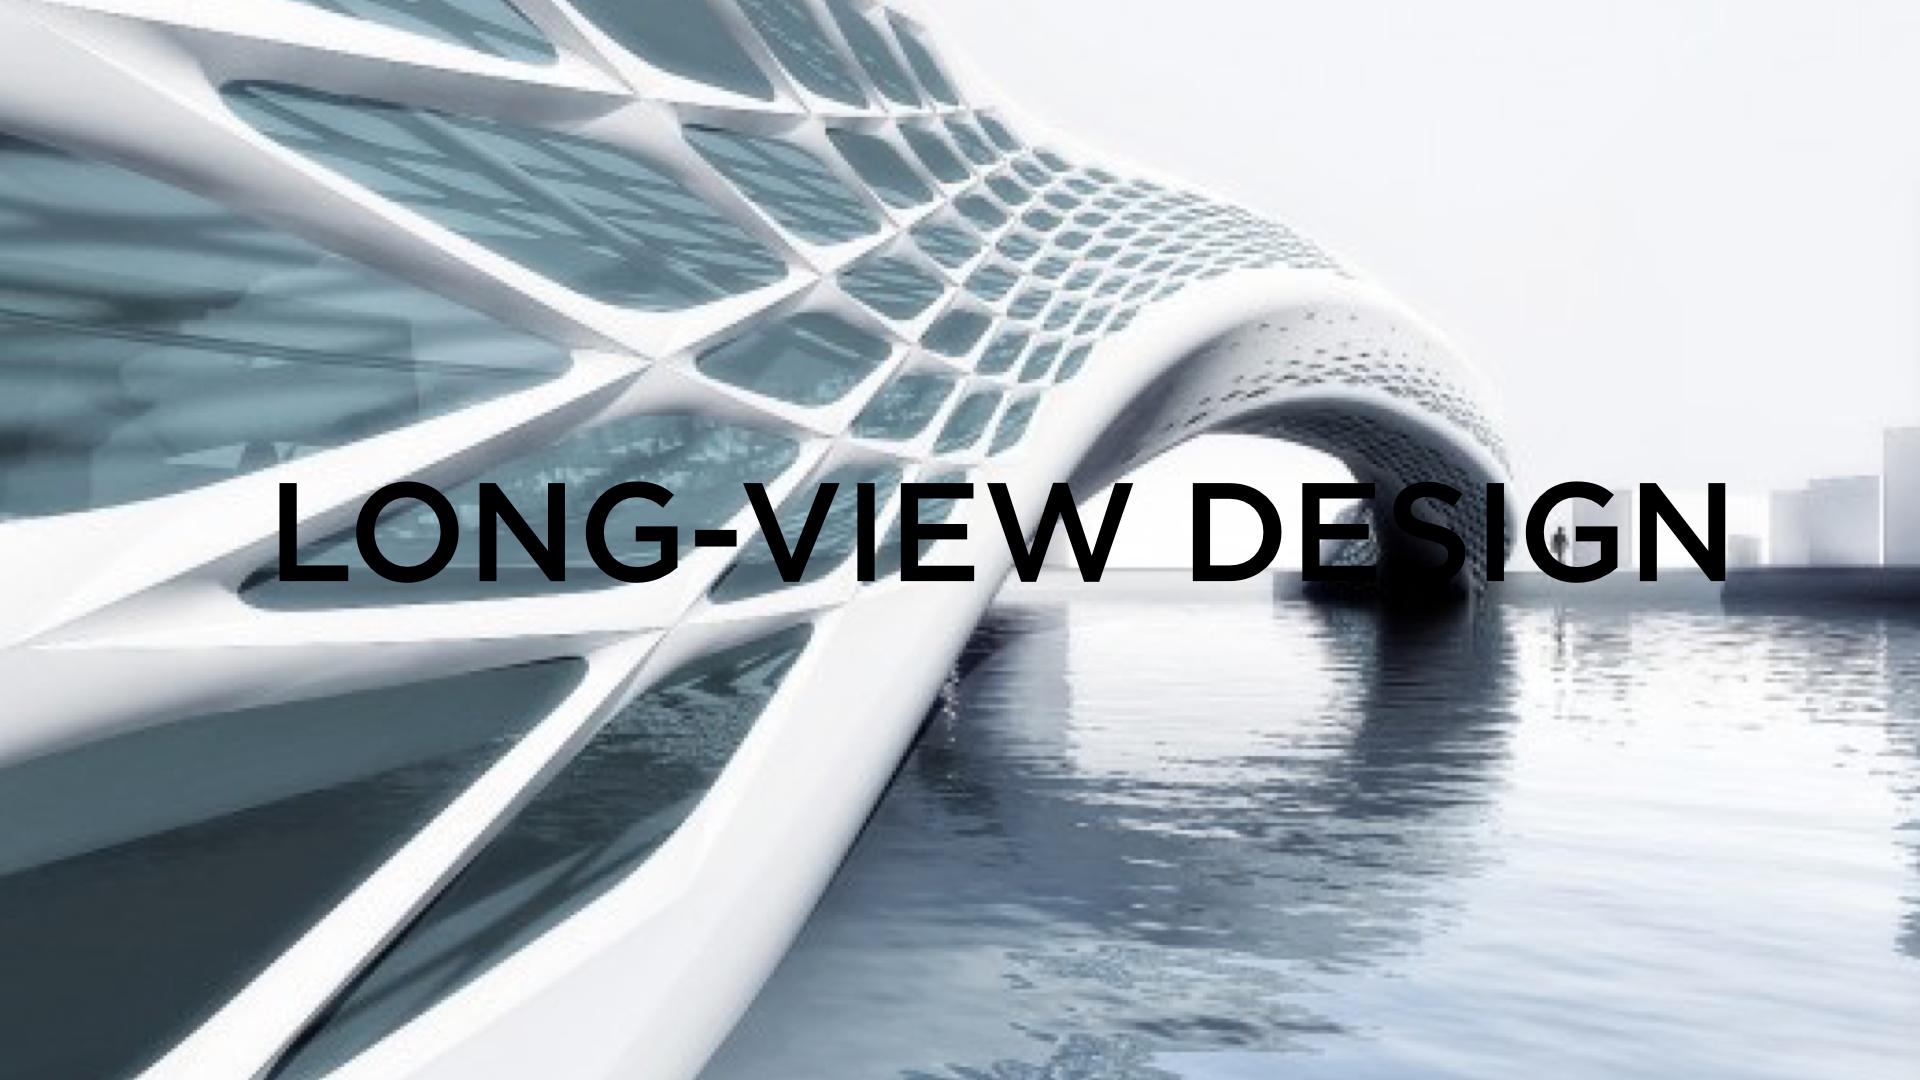 LongViewDesign copy.022.png